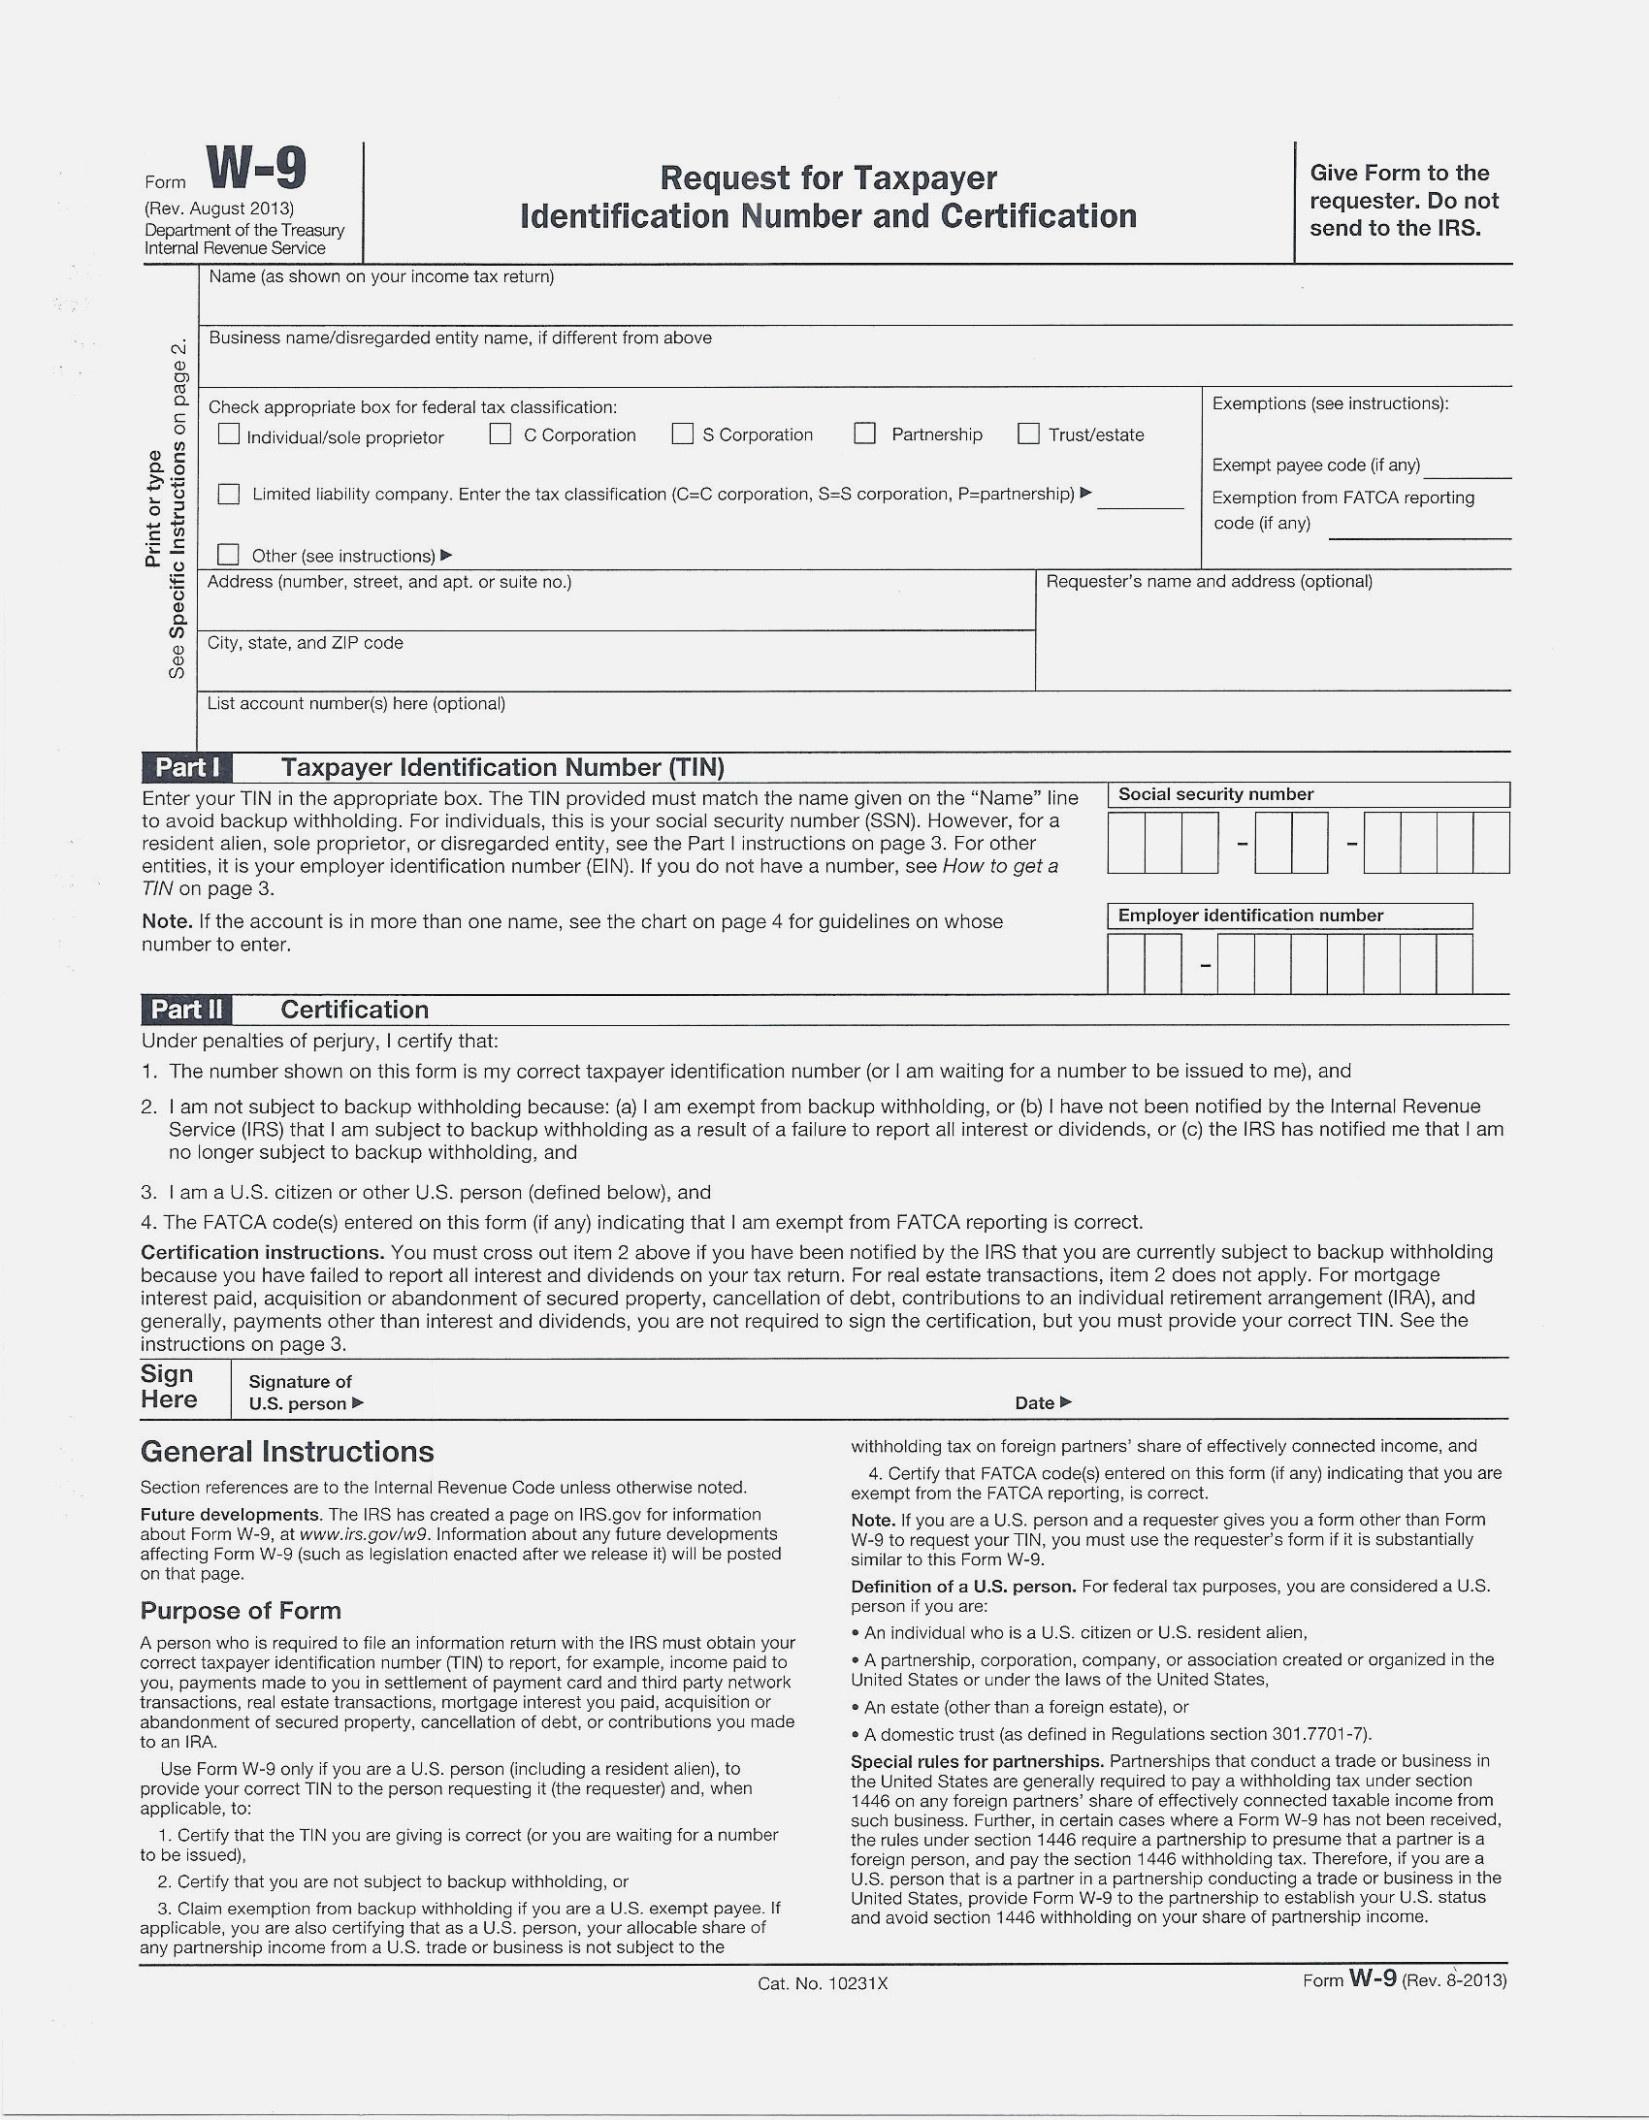 Fresh Free Printable W 14 Form | Downloadtarget – W9 Form Printable - Free Printable W 9